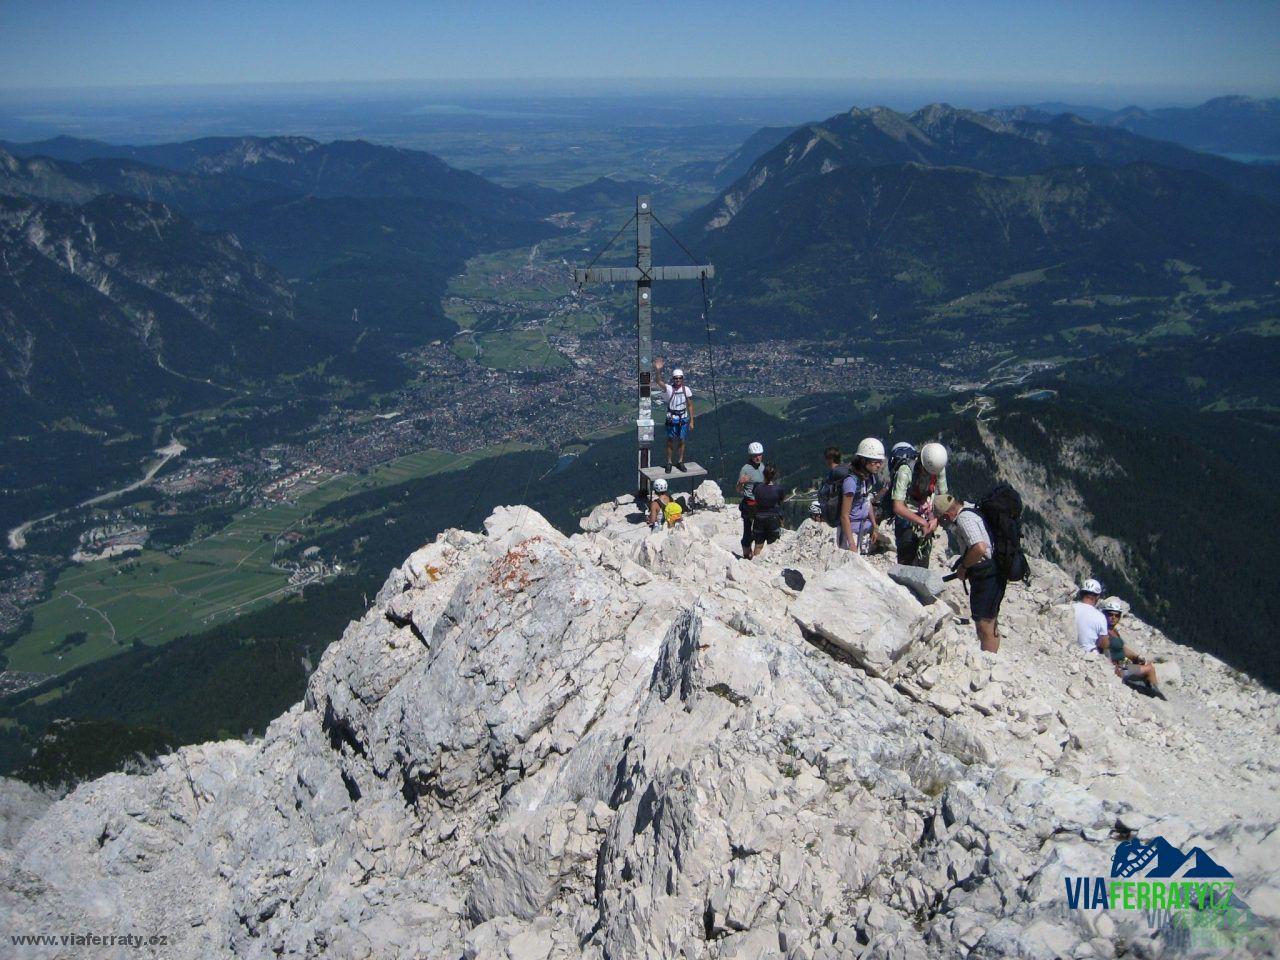 Klettersteig Ferrata : Alpspitz ferrata u2013 alpspitze klettersteig viaferraty.cz